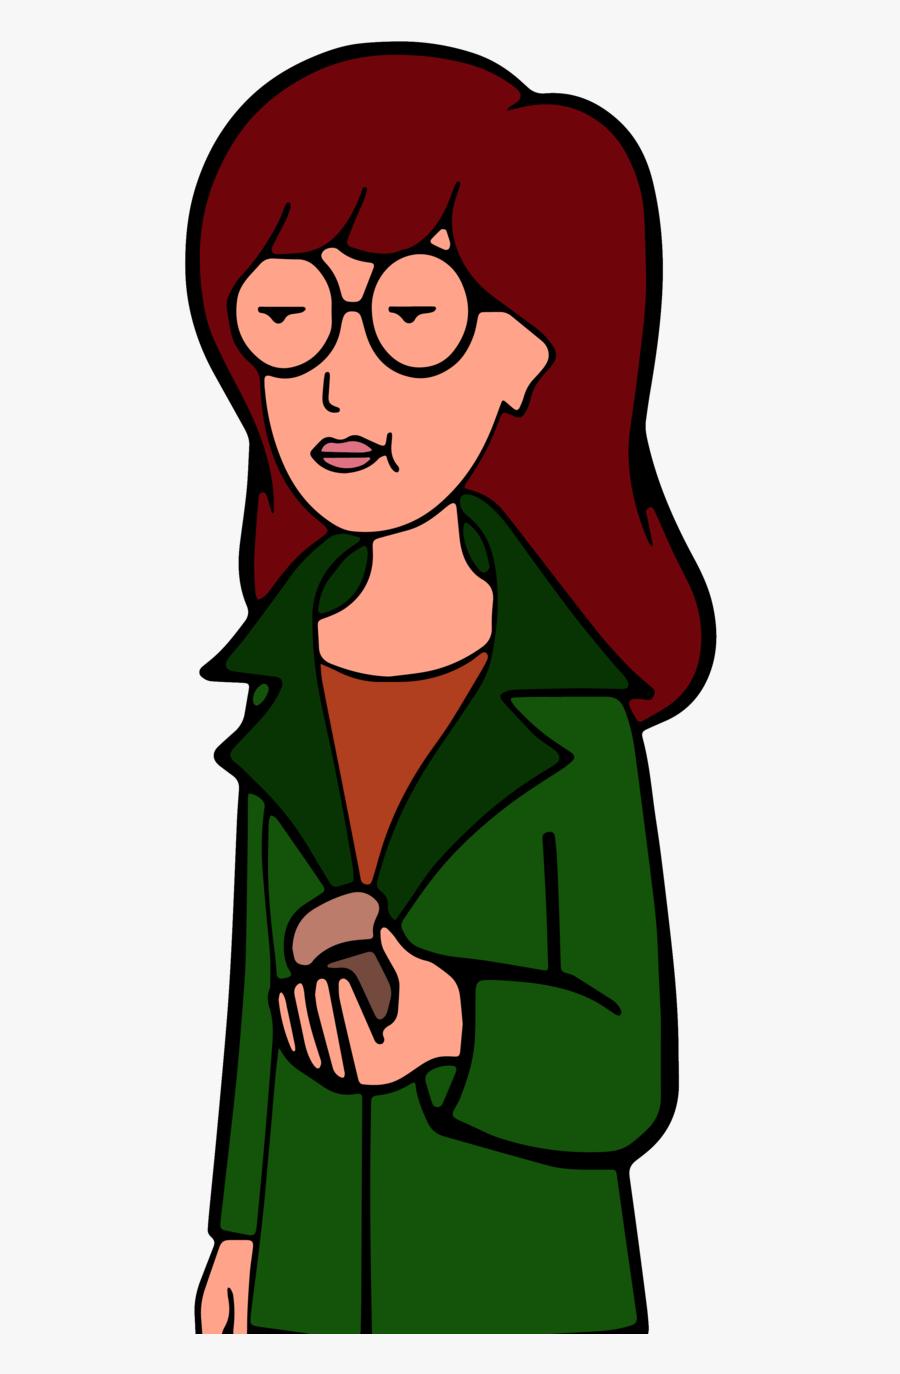 Cartoon,green,clip Care,happy,style - Daria Gif, Transparent Clipart